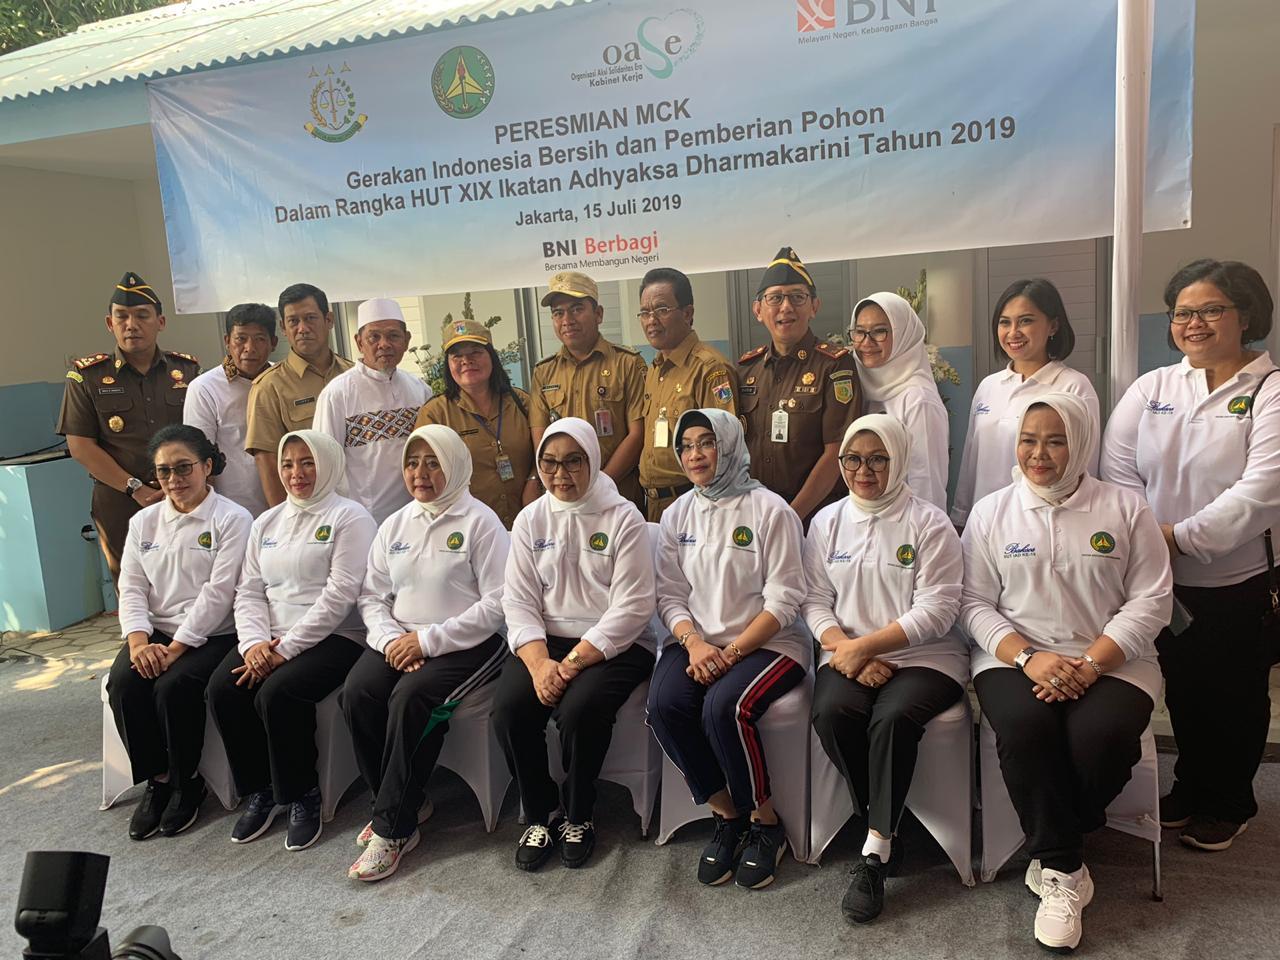 Ketua Ikatan Adhyaksa Dharma Karini, Ibu Ros Ellyana Prasetyo Resmikan 5 Titik MCK Diwilayah DKI Jakarta